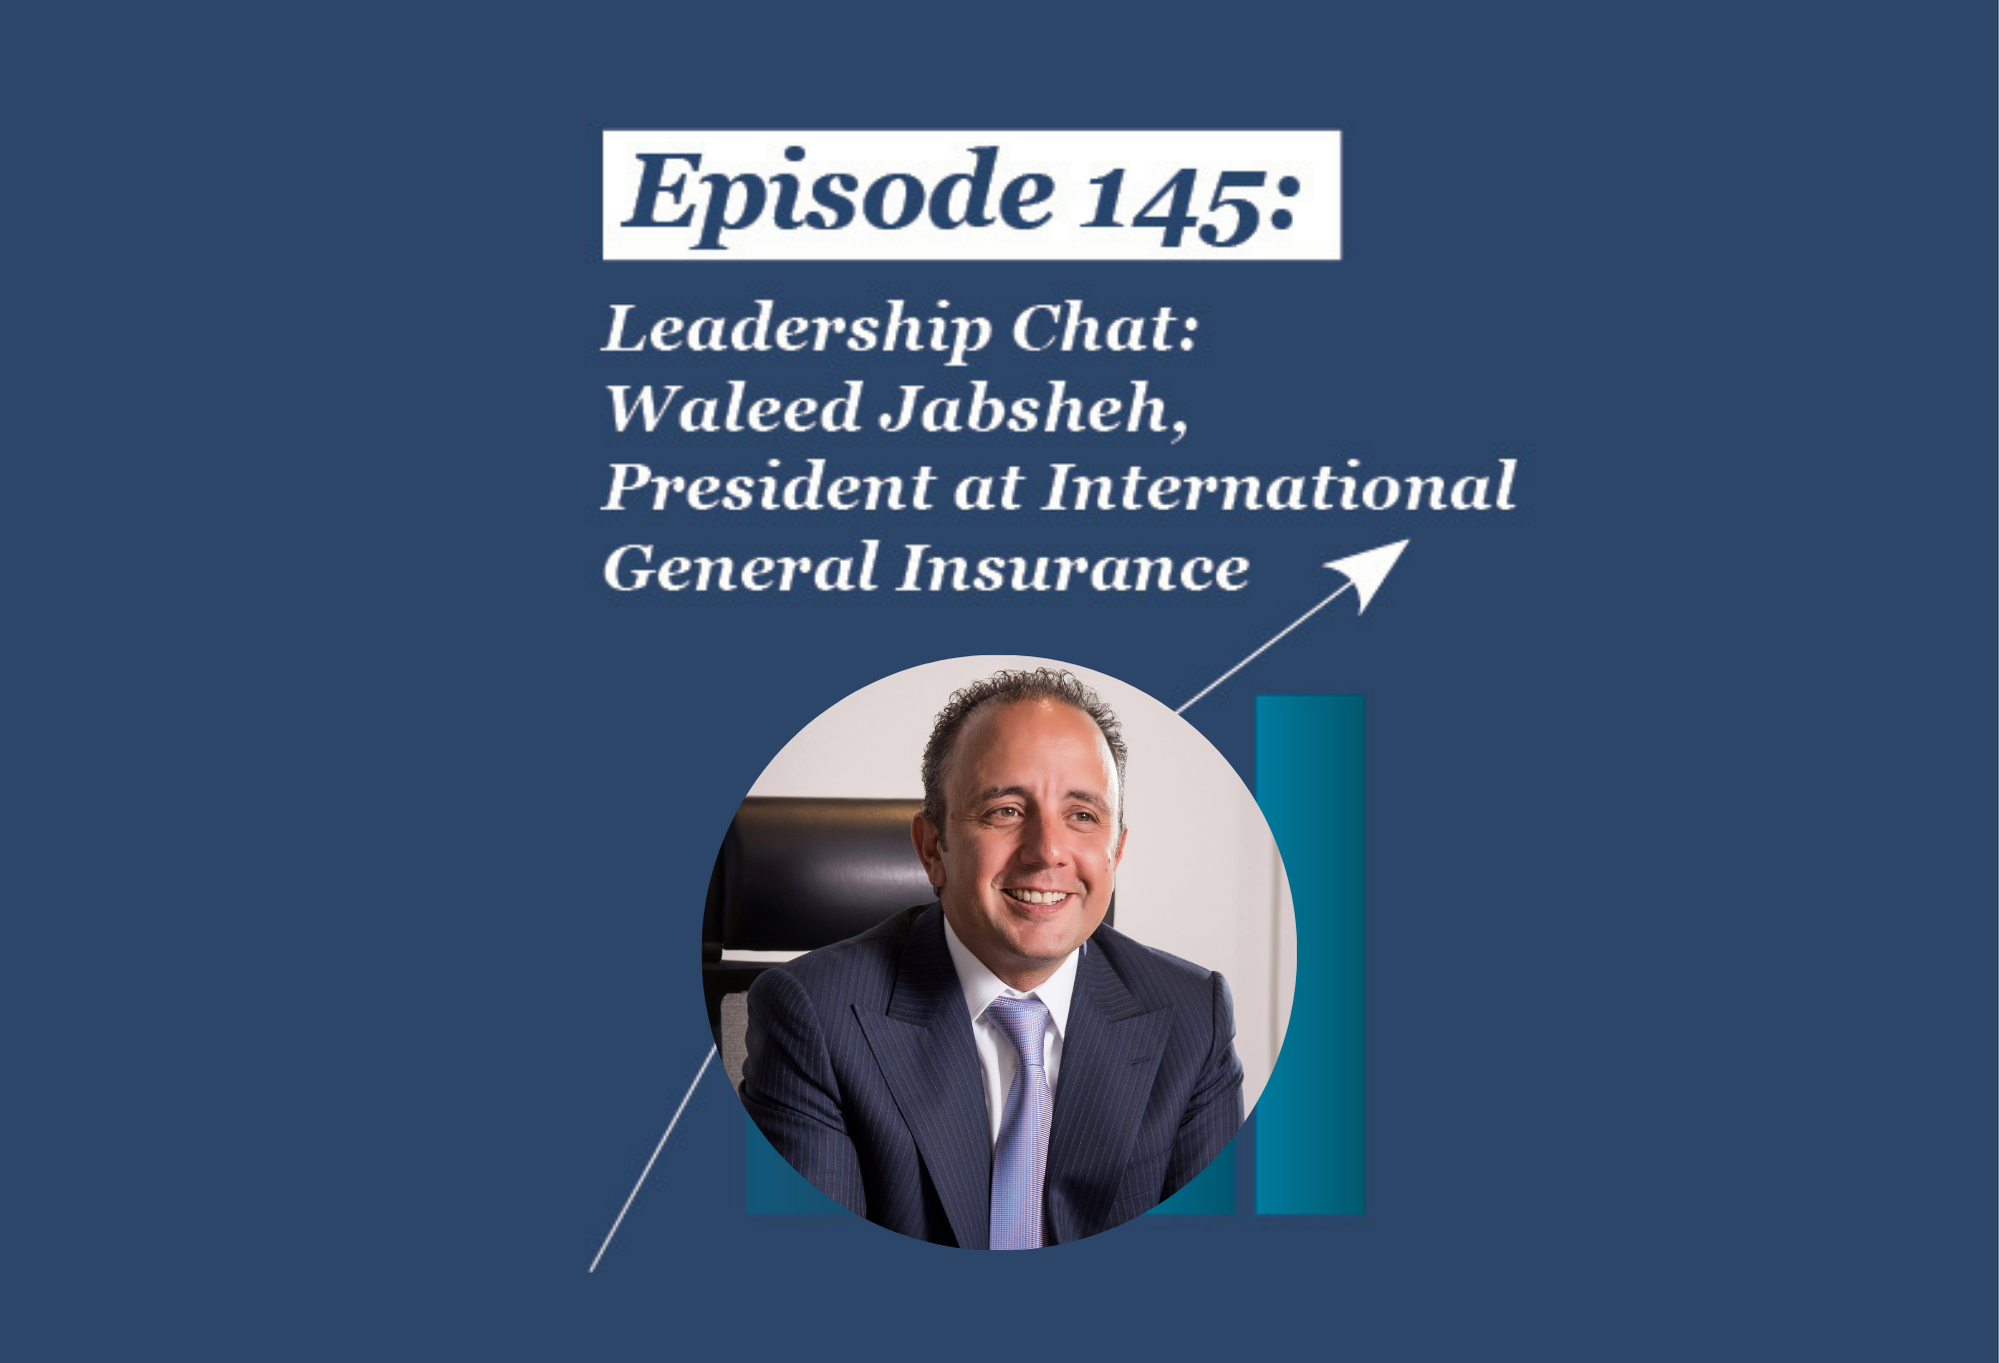 Absolute Return Podcast #145: Leadership Chat: Waleed Jabsheh, President at International General Insurance